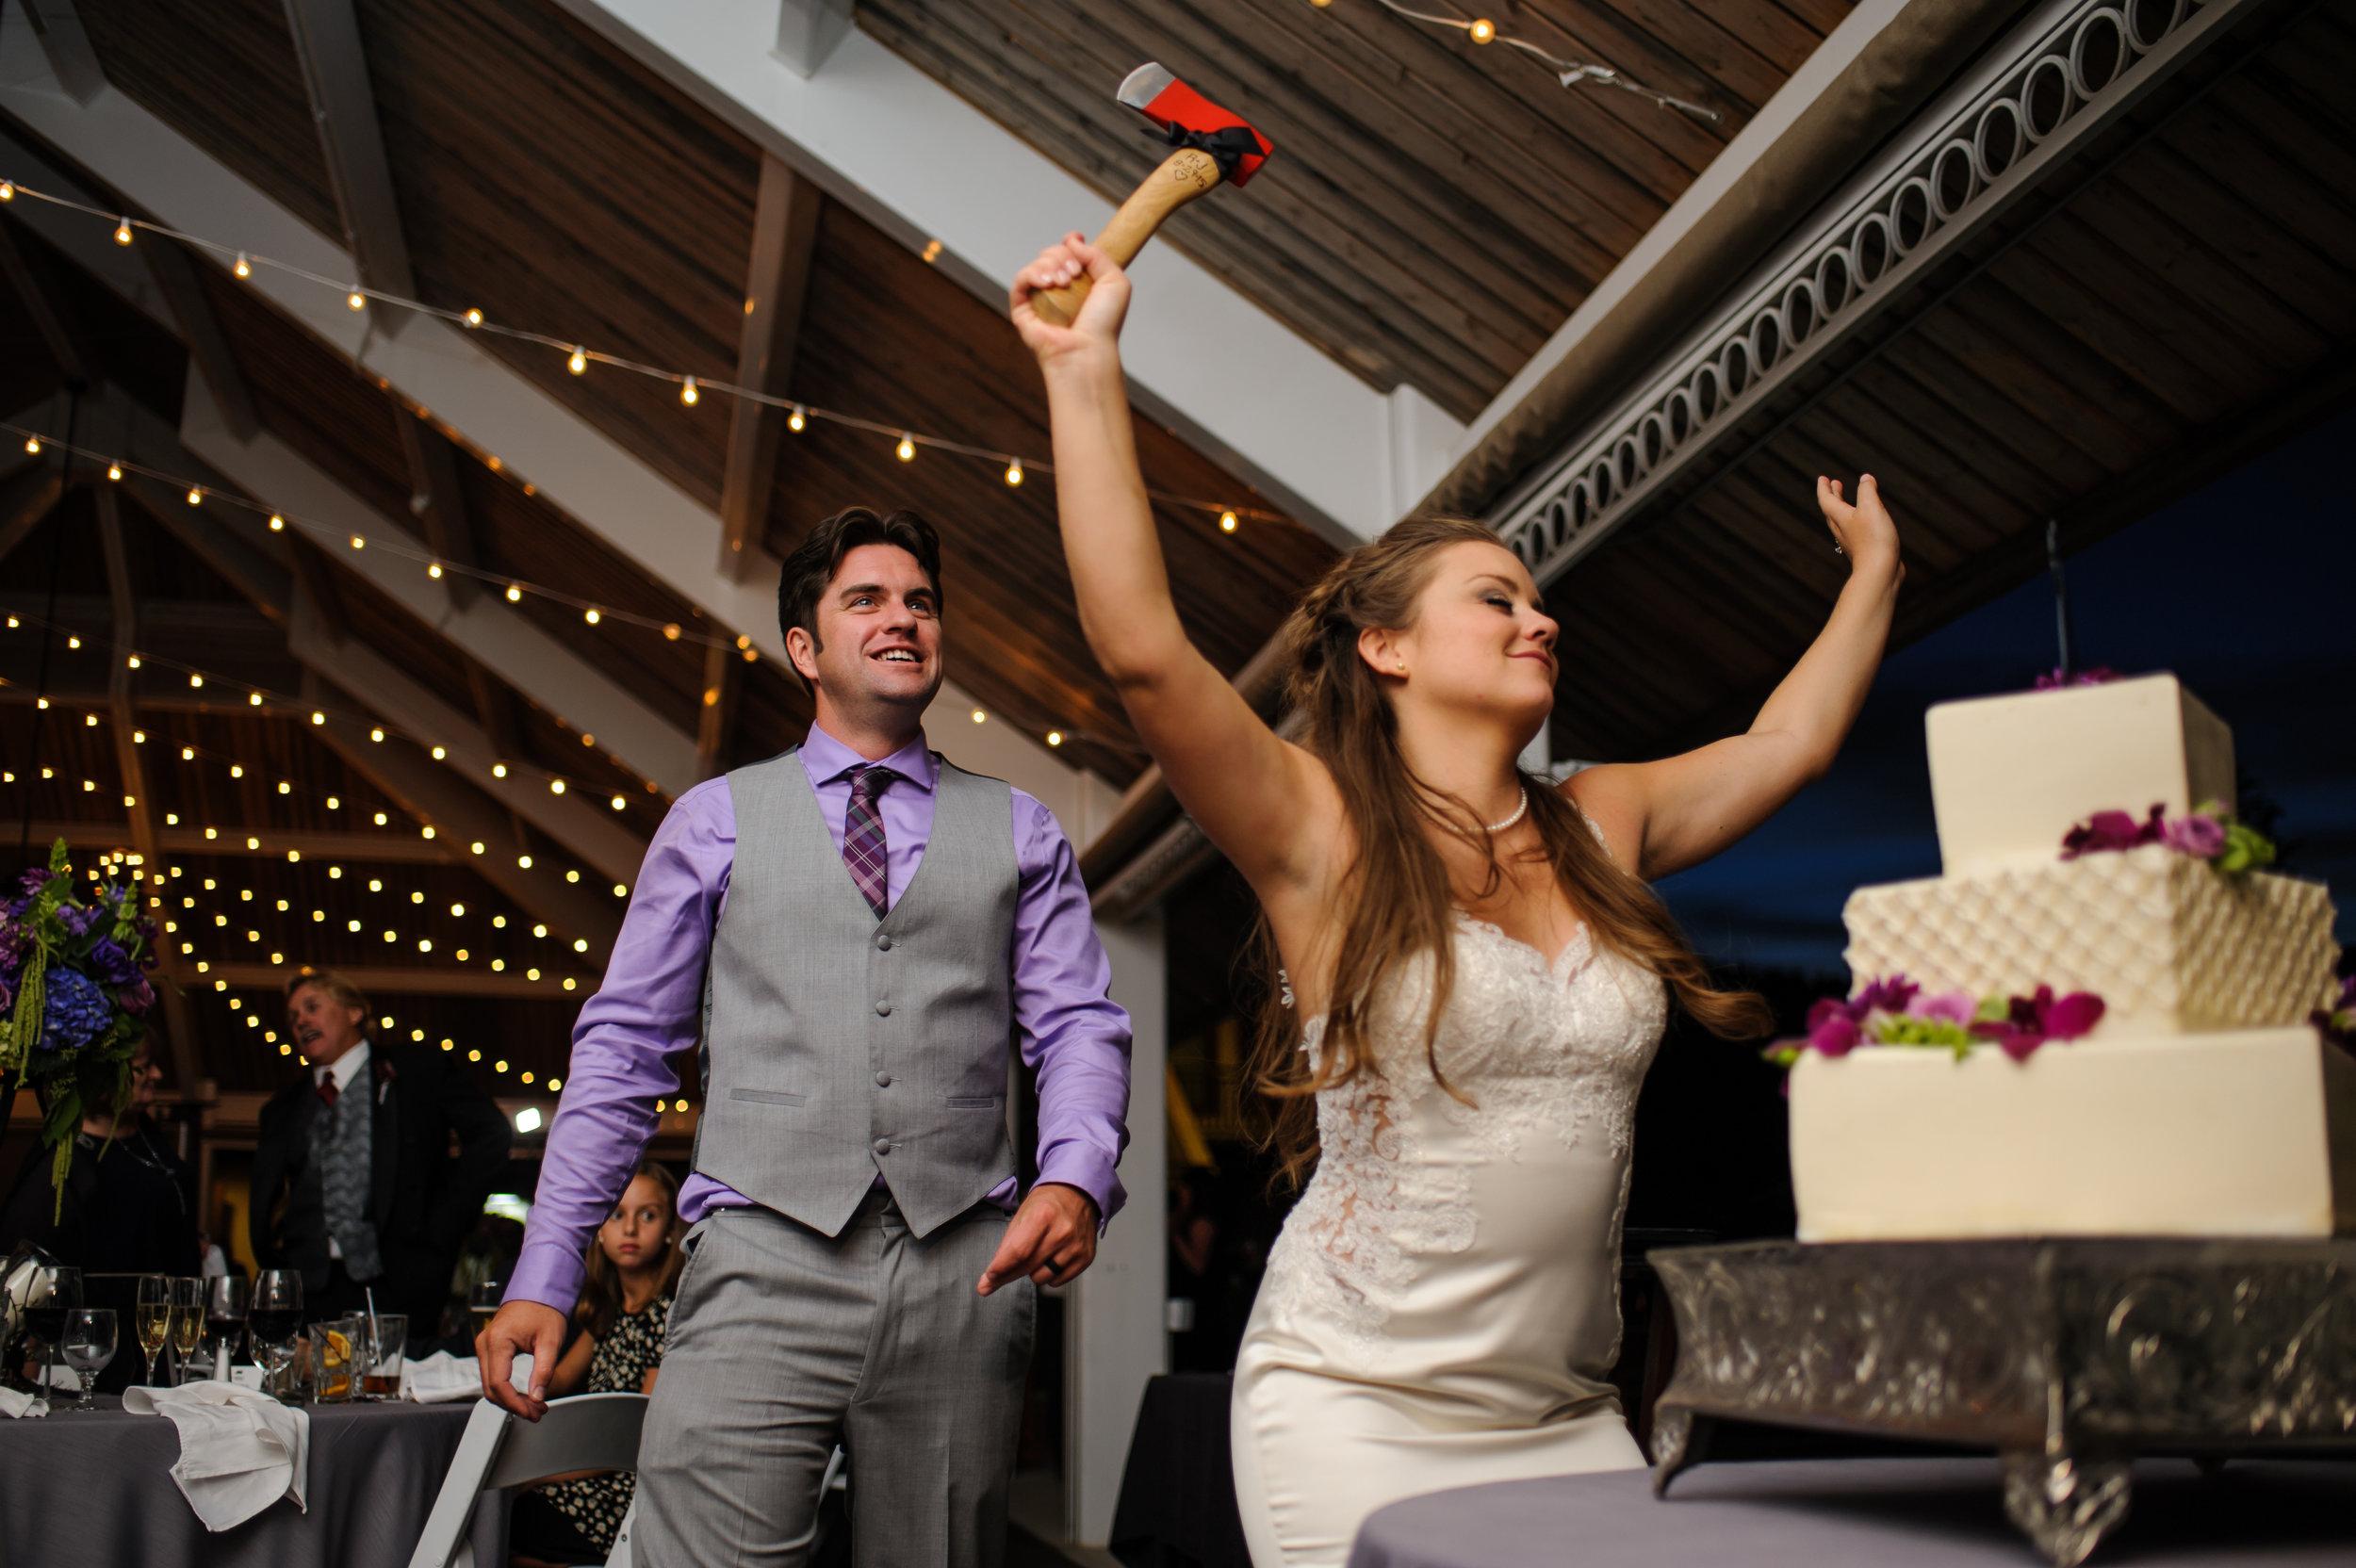 becca-jacob-038-tenaya-lodge-yosemite-wedding-photographer-katherine-nicole-photography.JPG